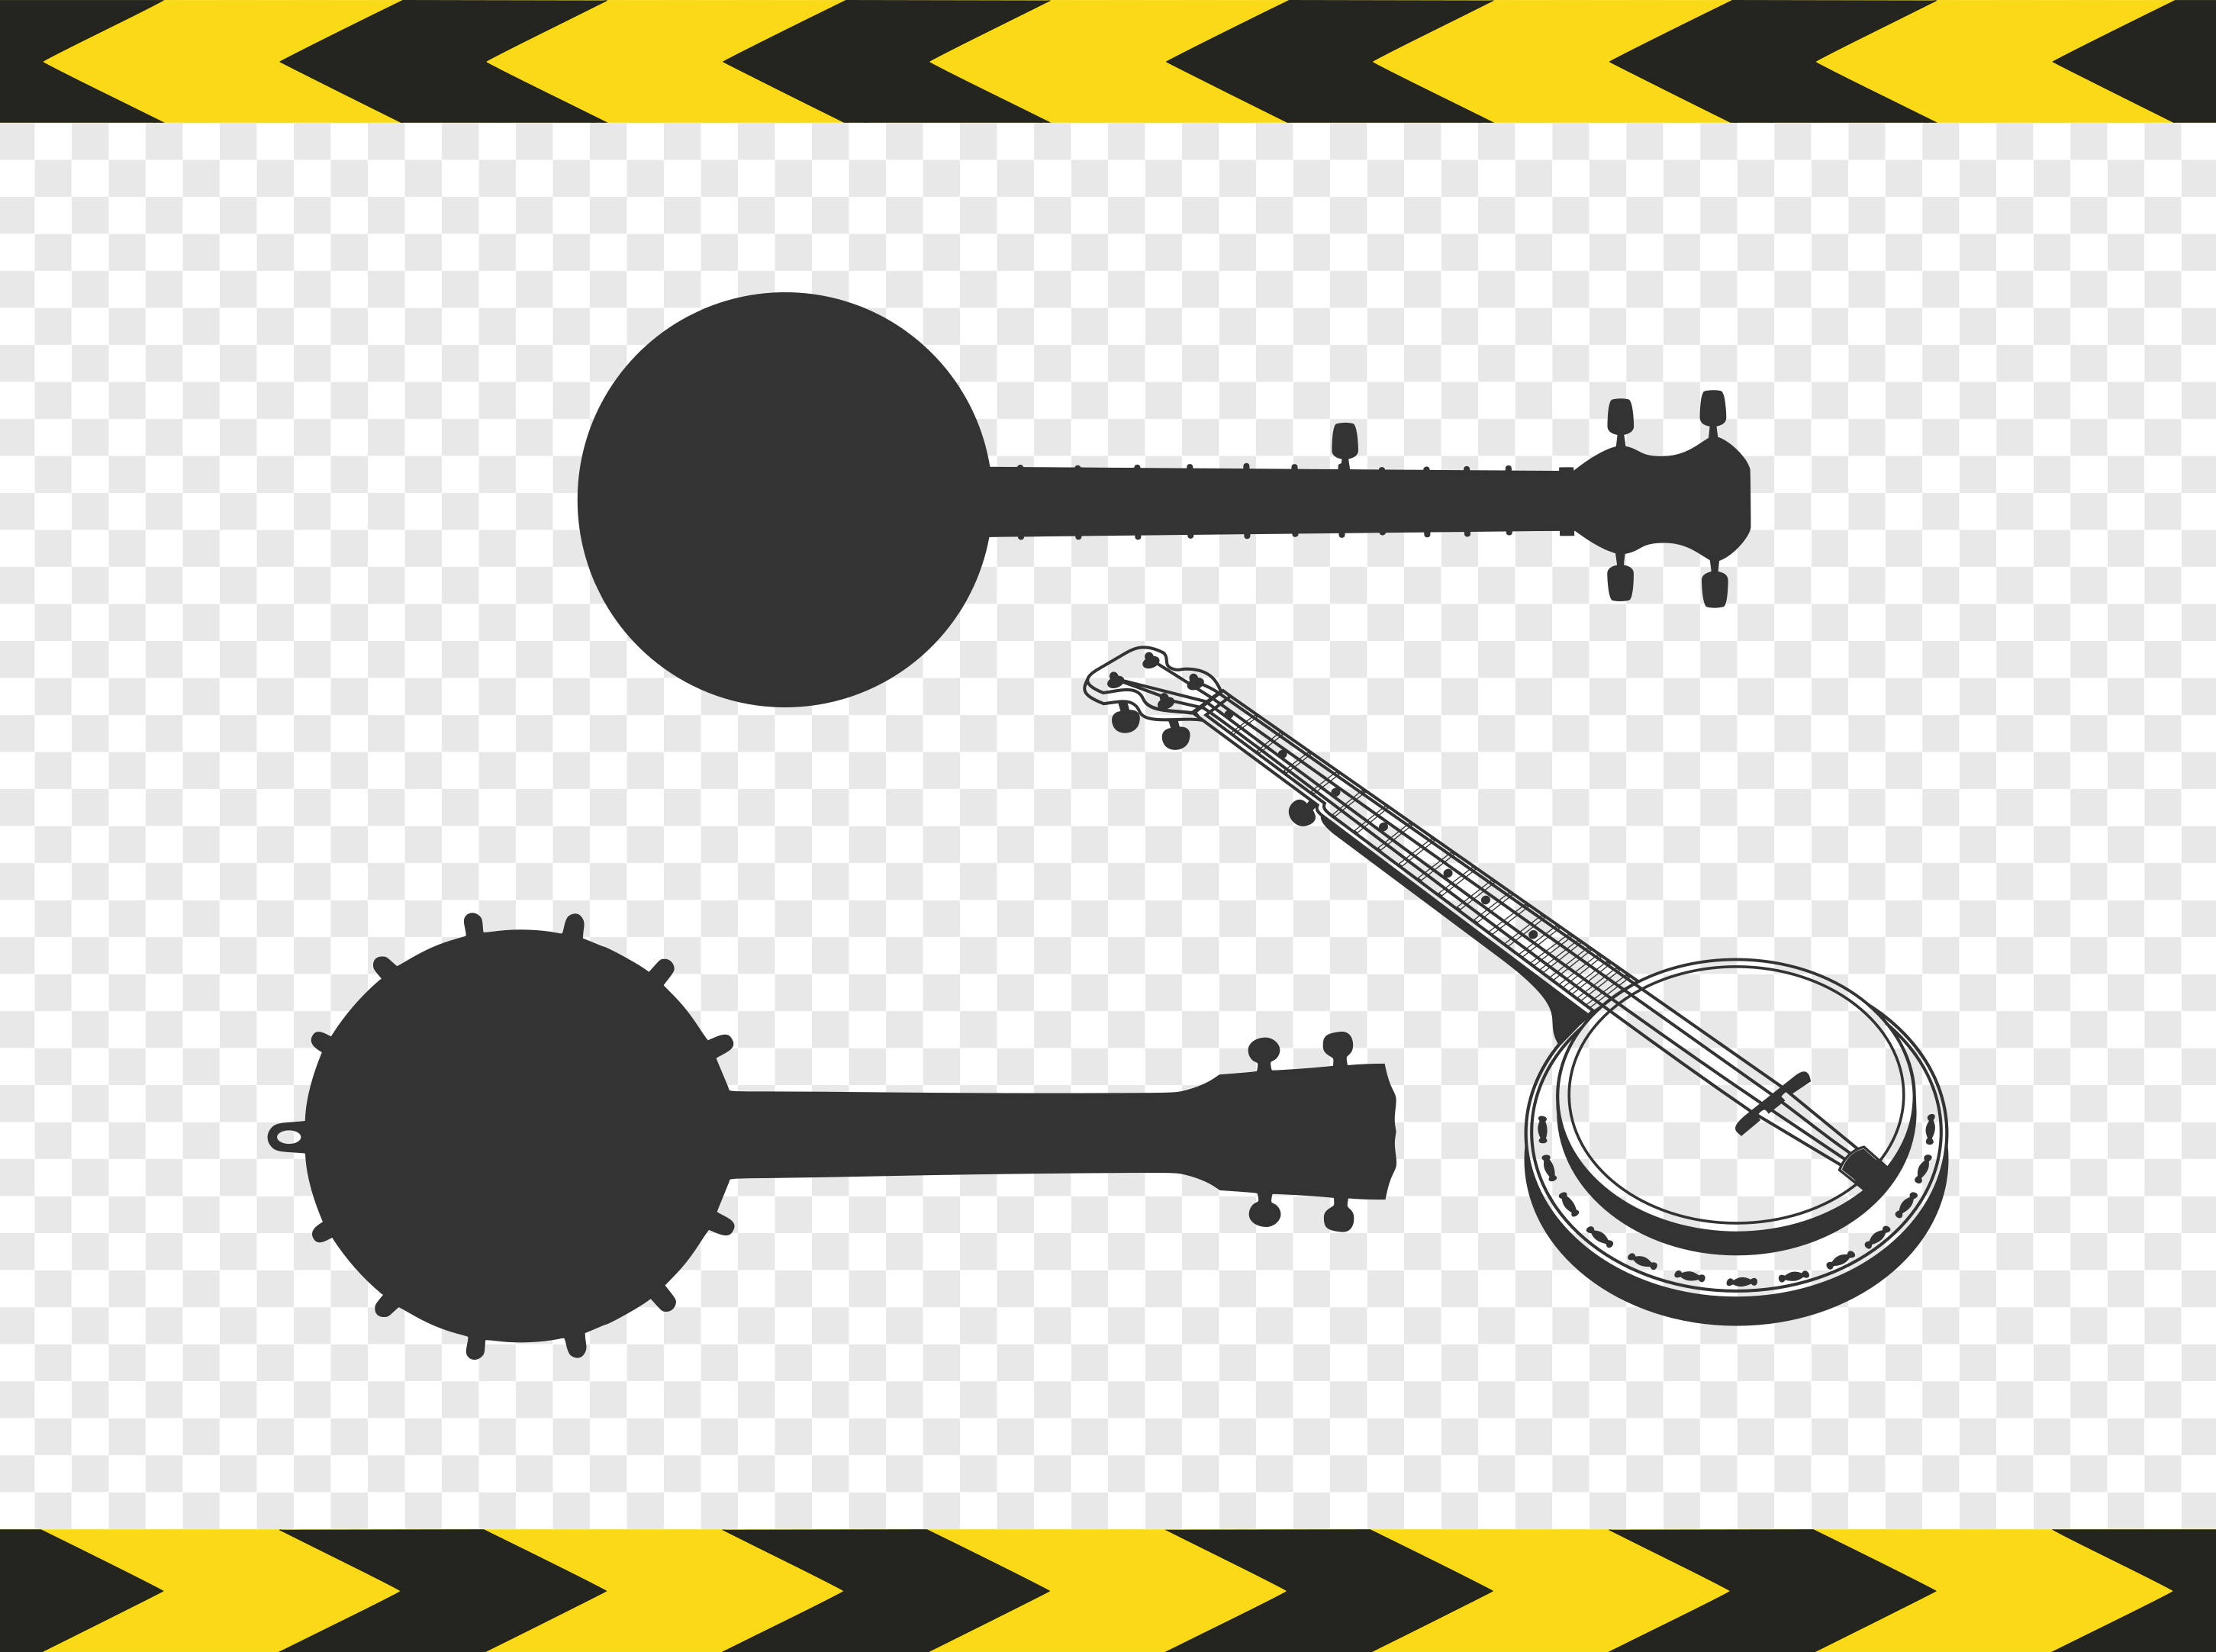 Banjo clipart silhouette. Svg diy car decal